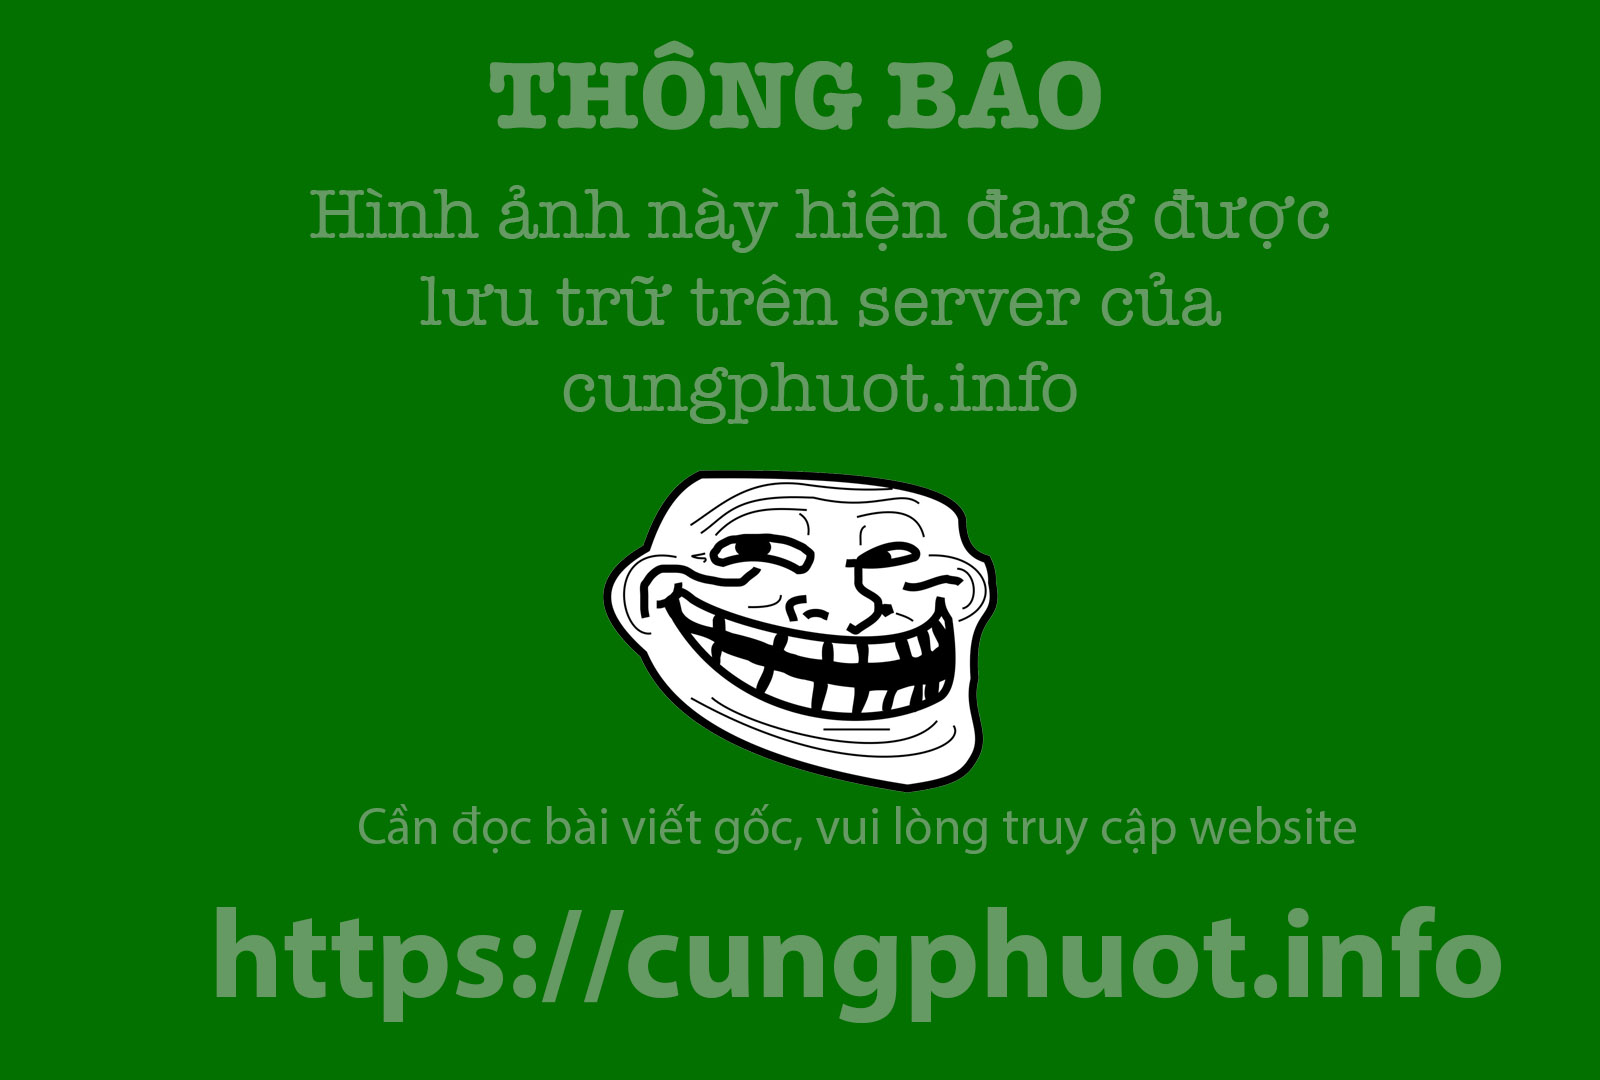 Den Moc Chau san mai anh dao hinh anh 6